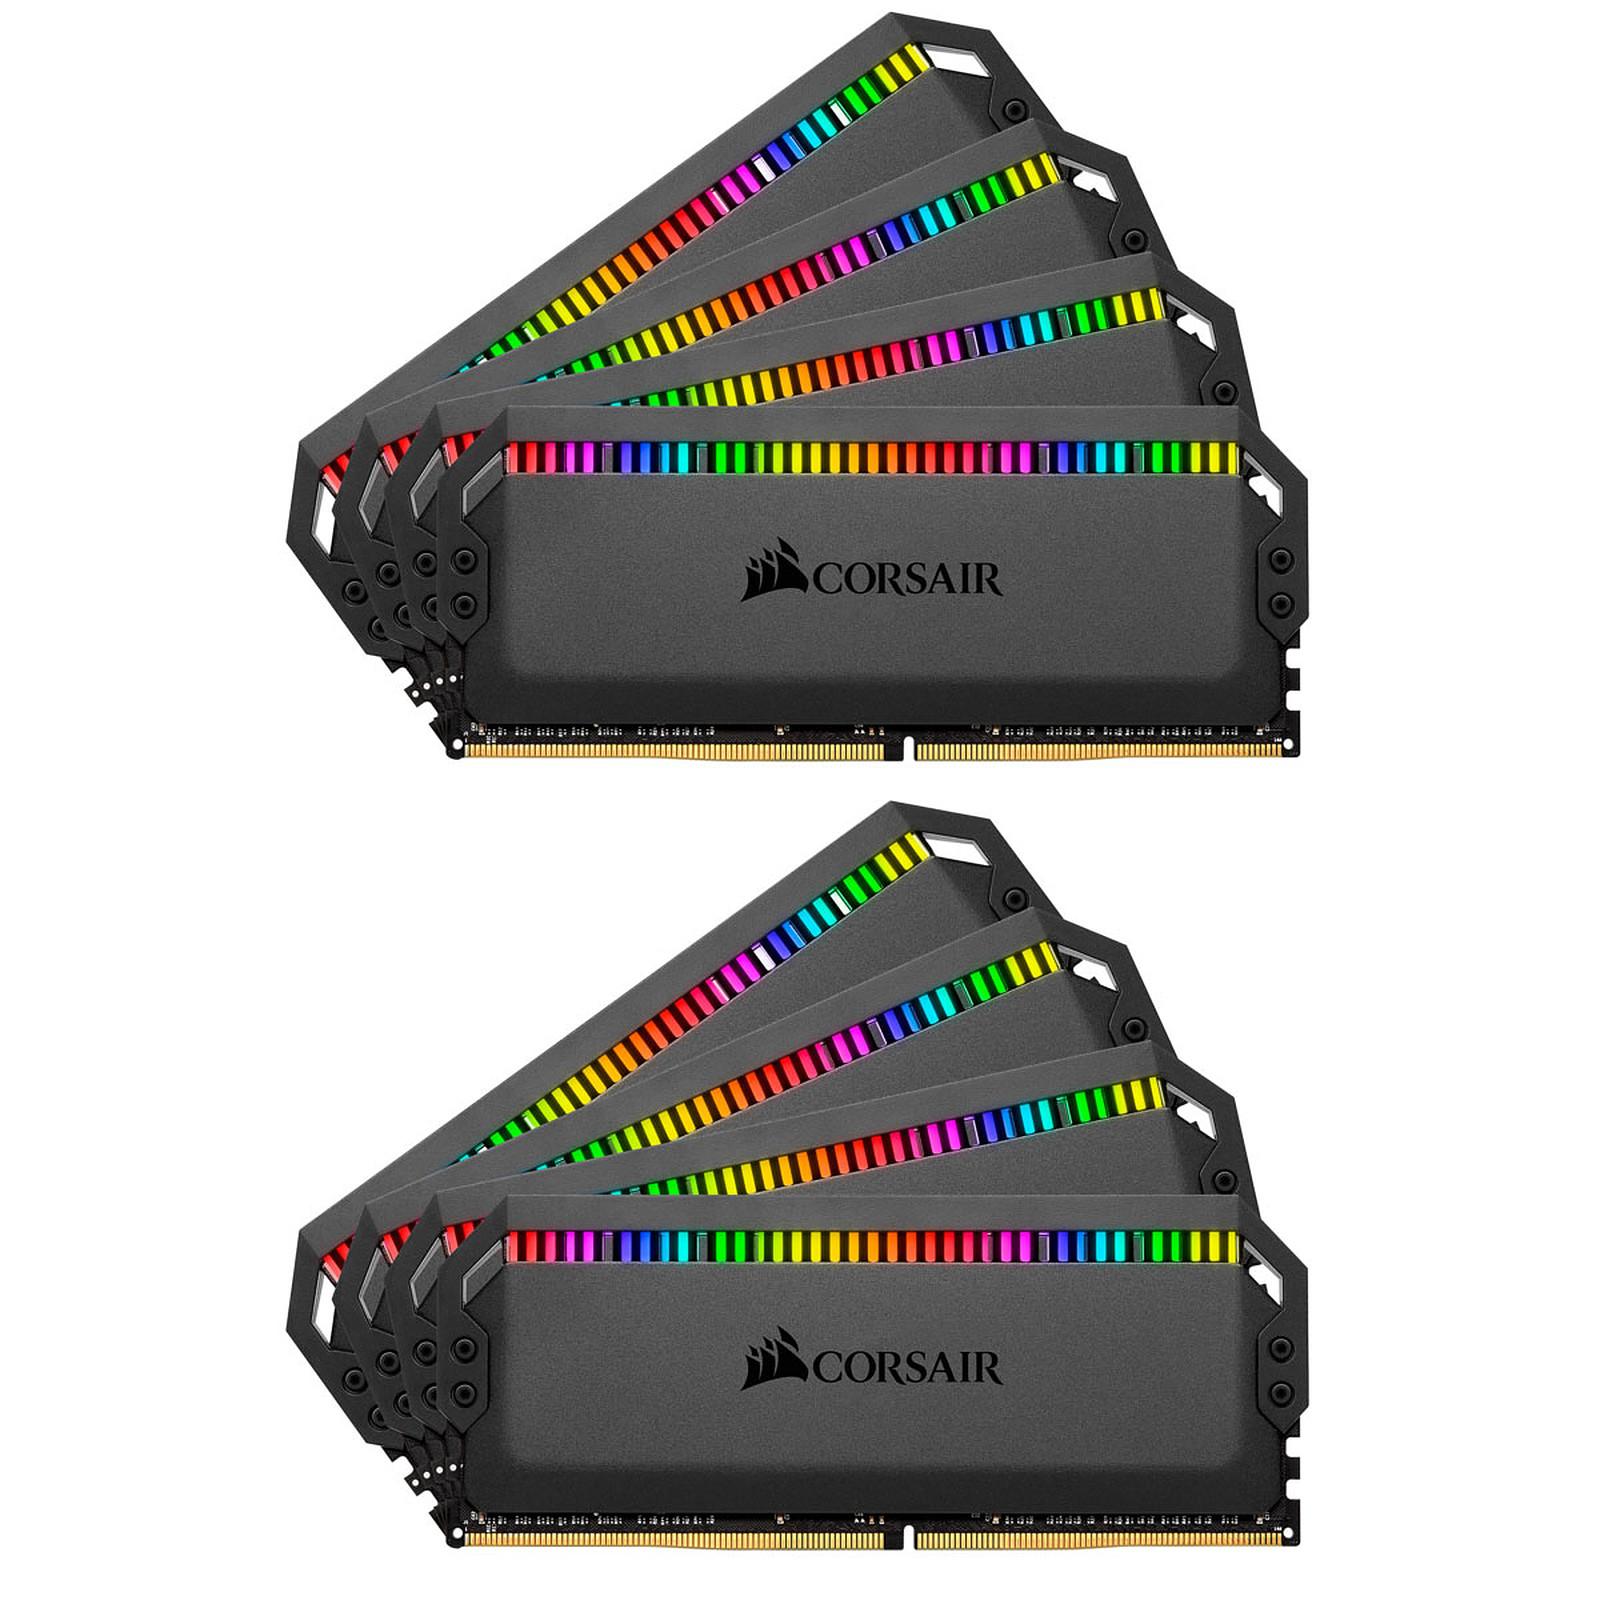 Corsair Dominator Platinum RGB 128 GB (8 x 16 GB) DDR4 3800 MHz CL19